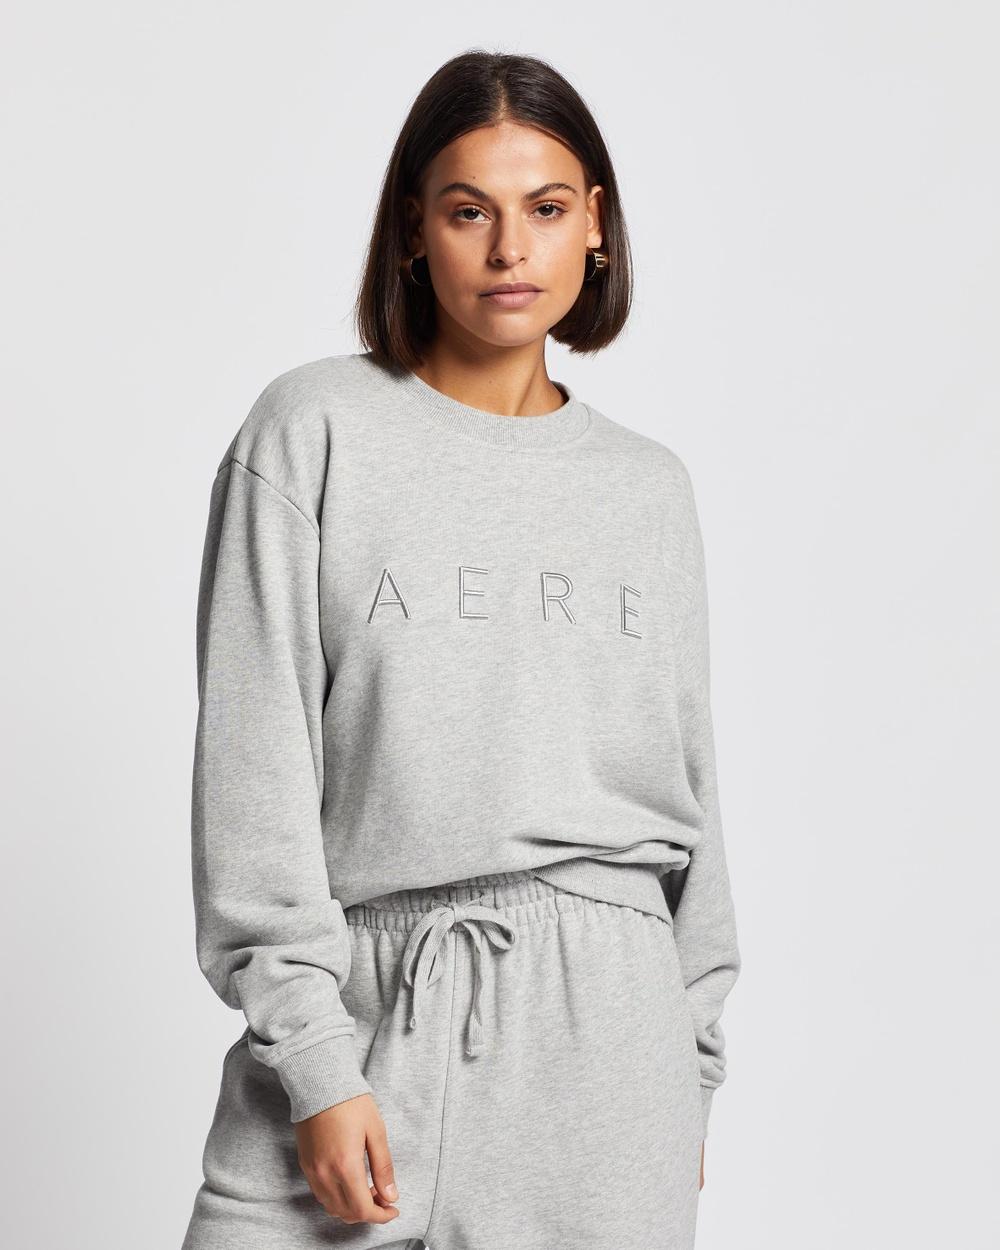 AERE Organic Cotton Aere Sweat Top Sweats Grey Marle